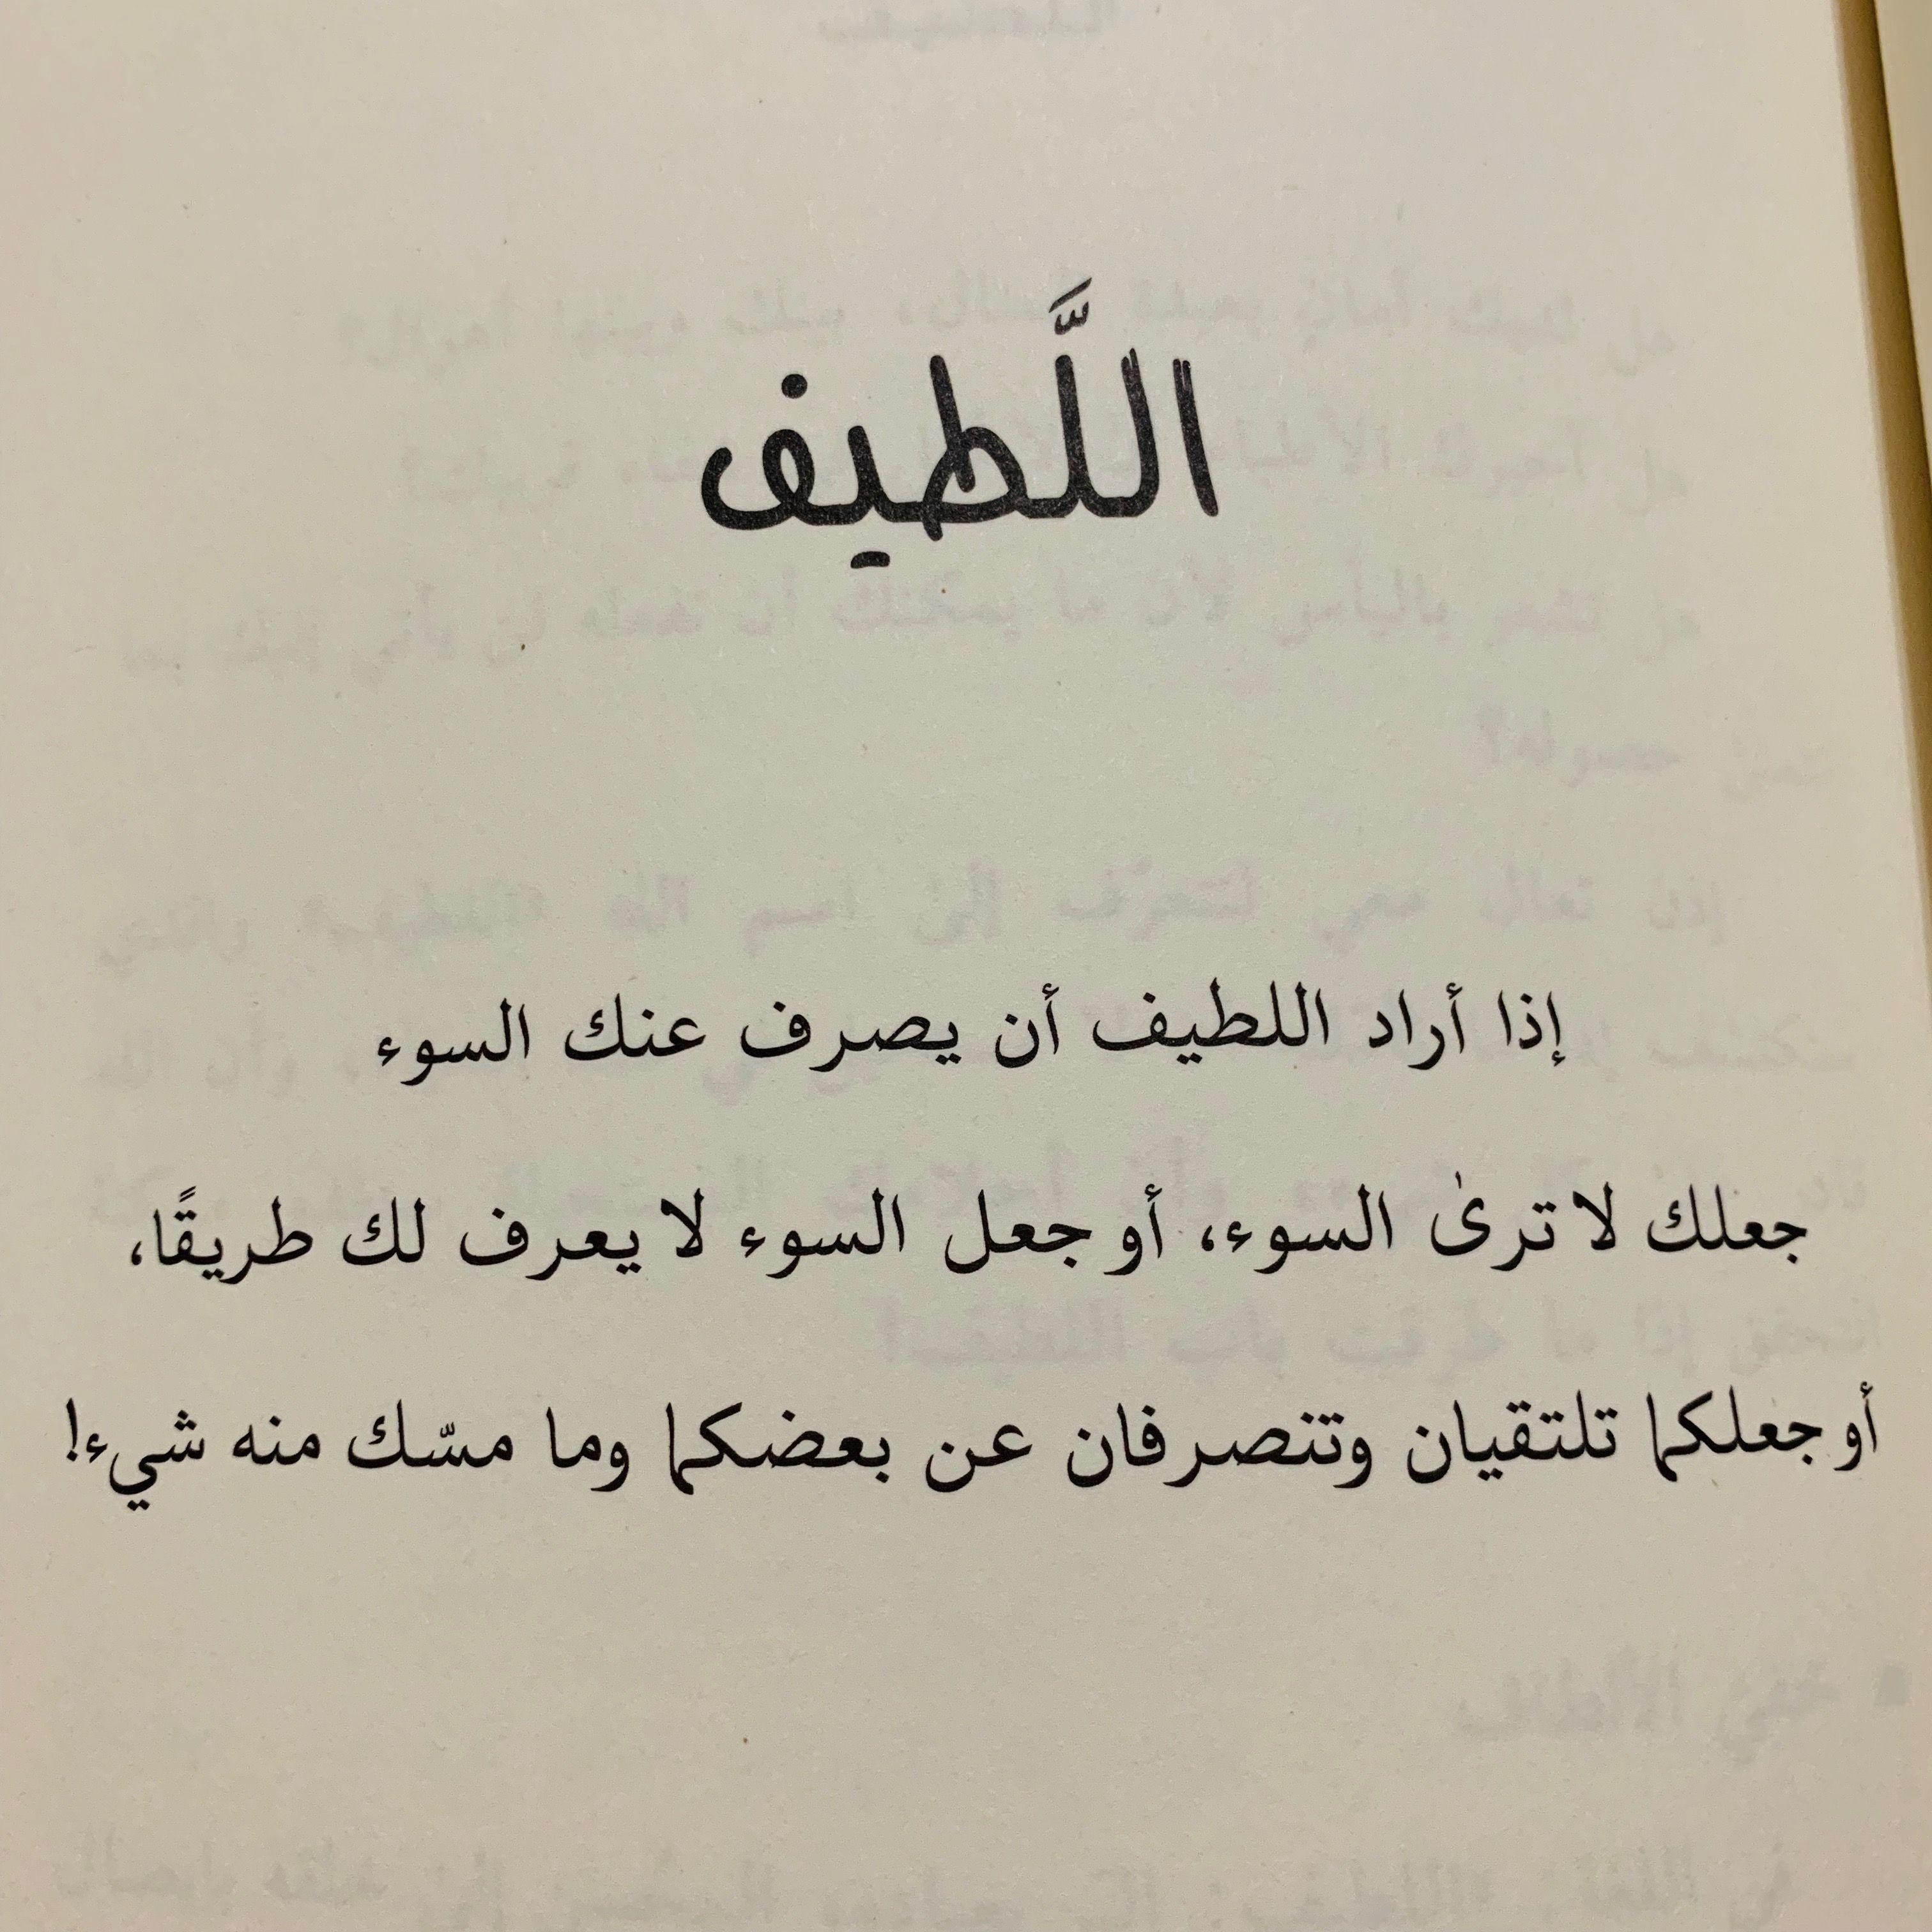 كتاب لأنك الله Quotes Book Quotes Arabic Quotes